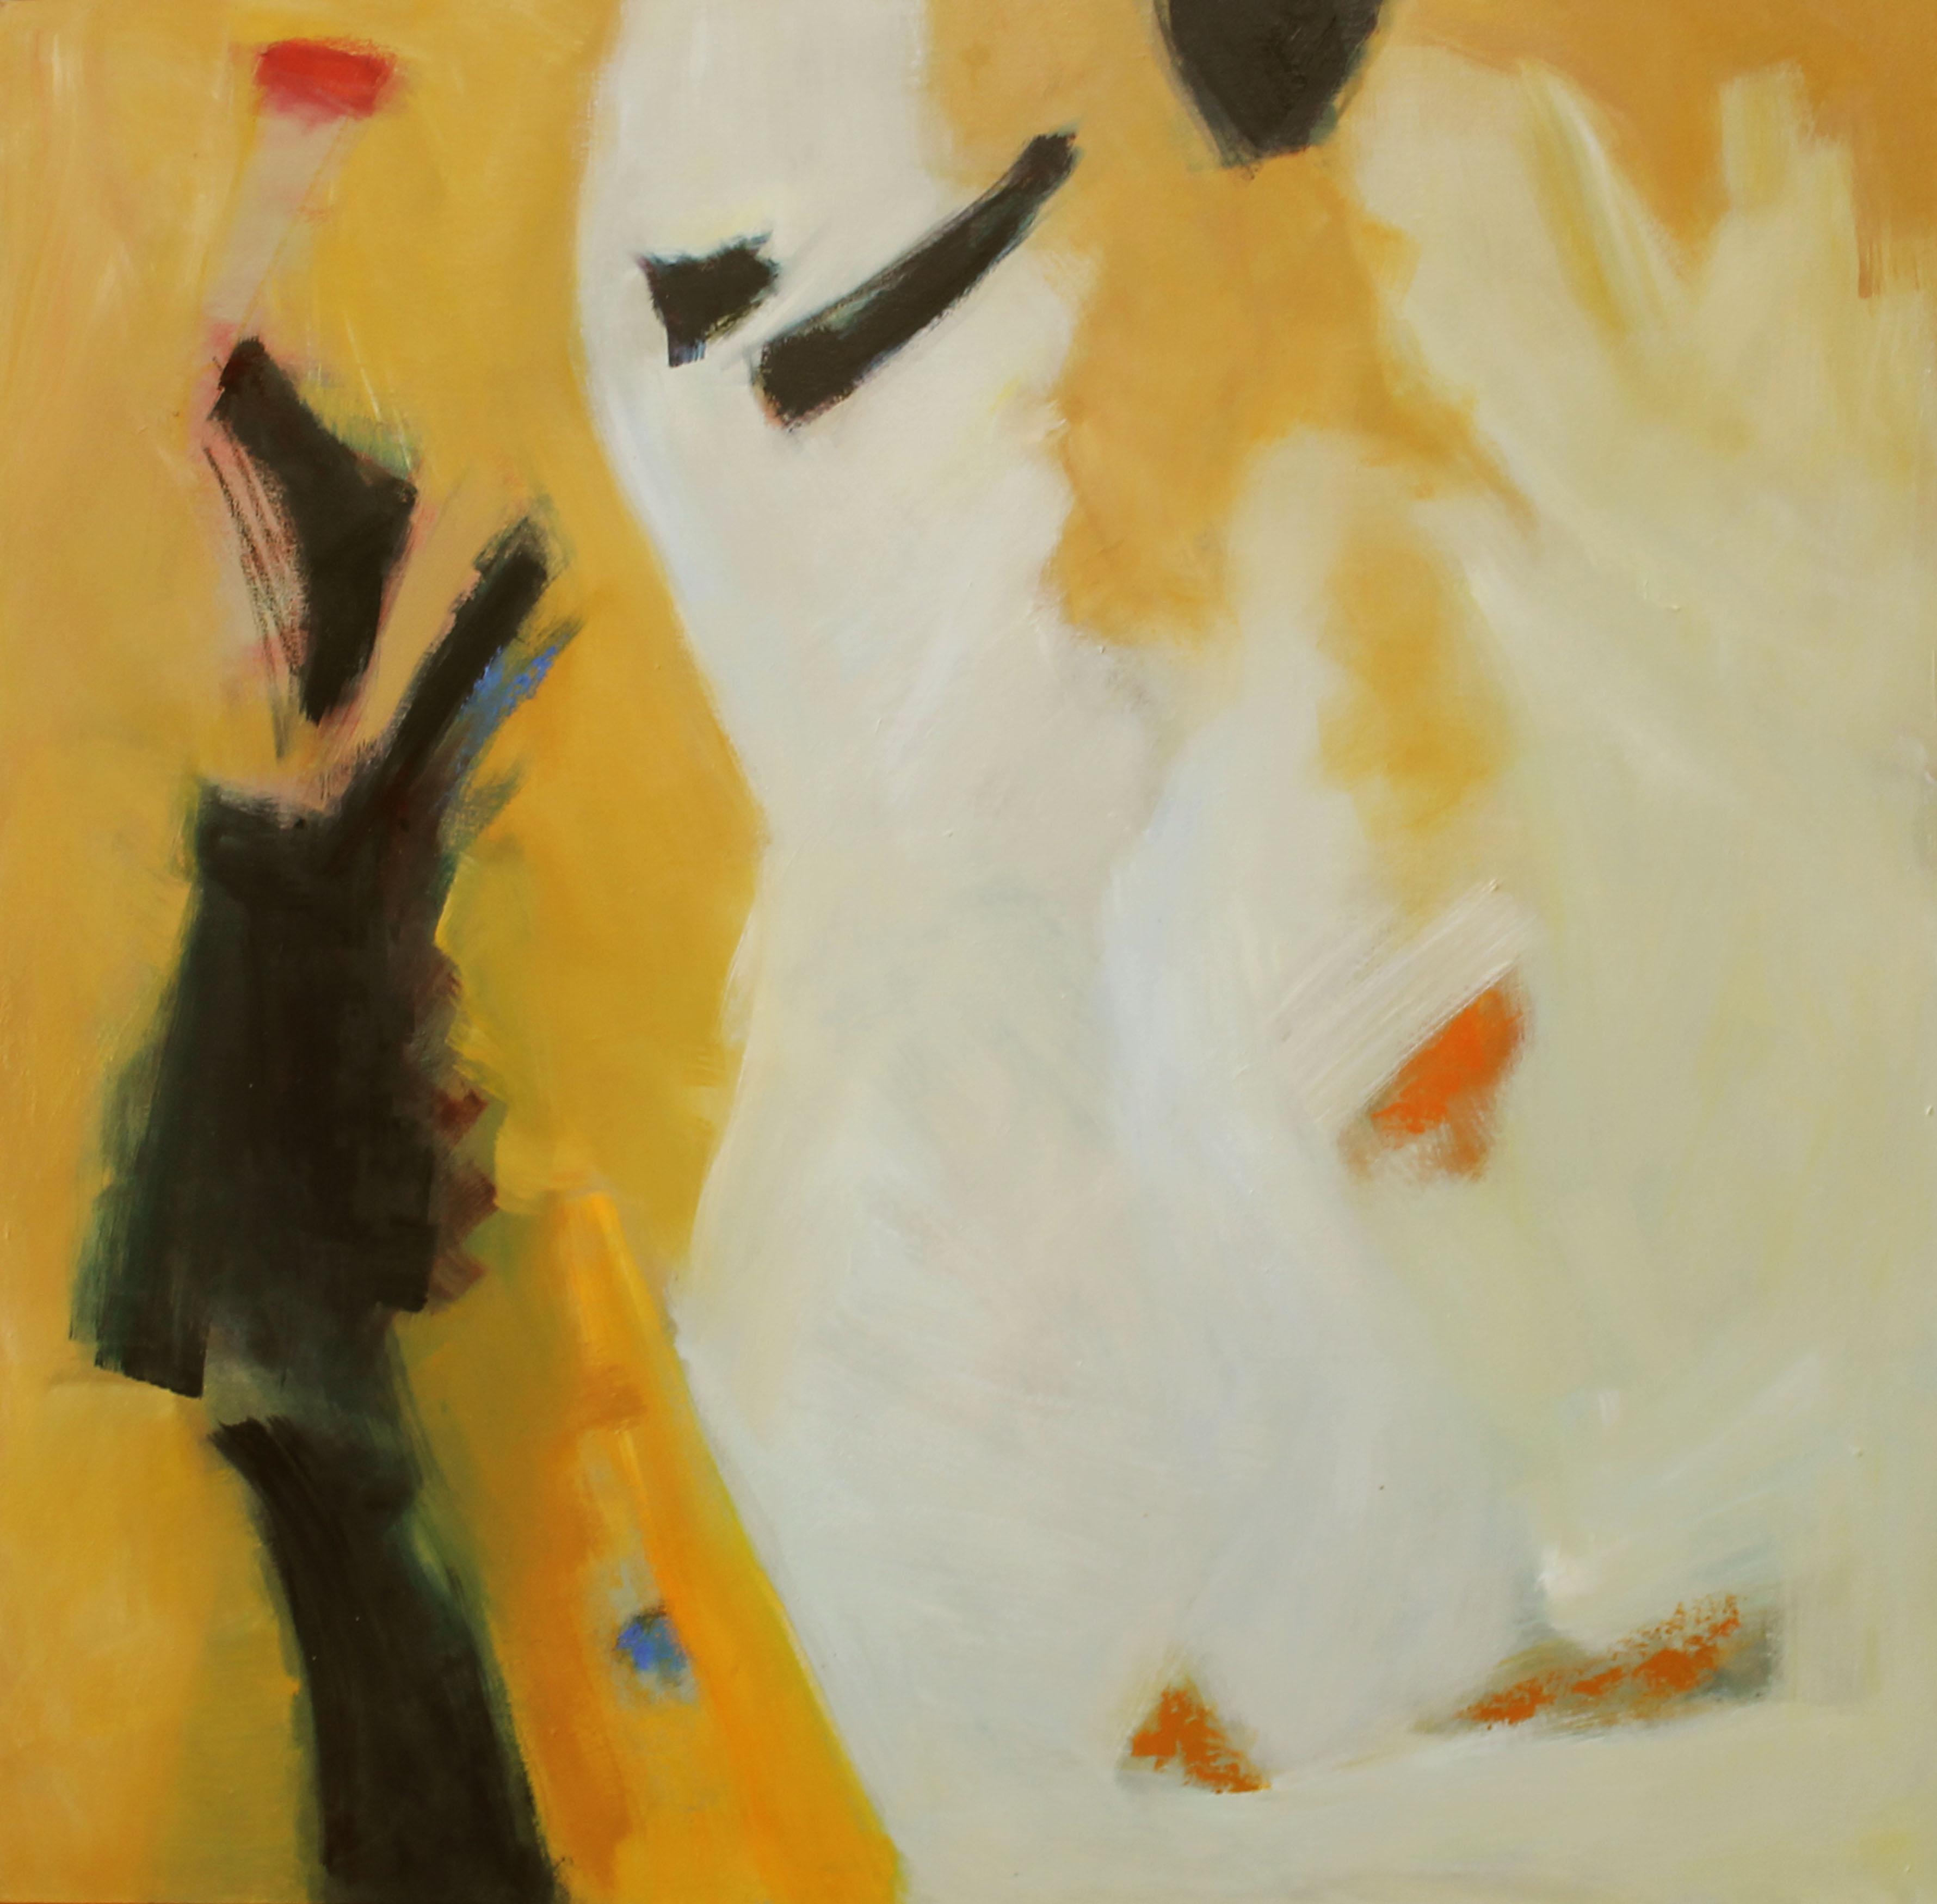 QUIETUD,Oleo sobre lienzo,120x120 cm,47x47 In